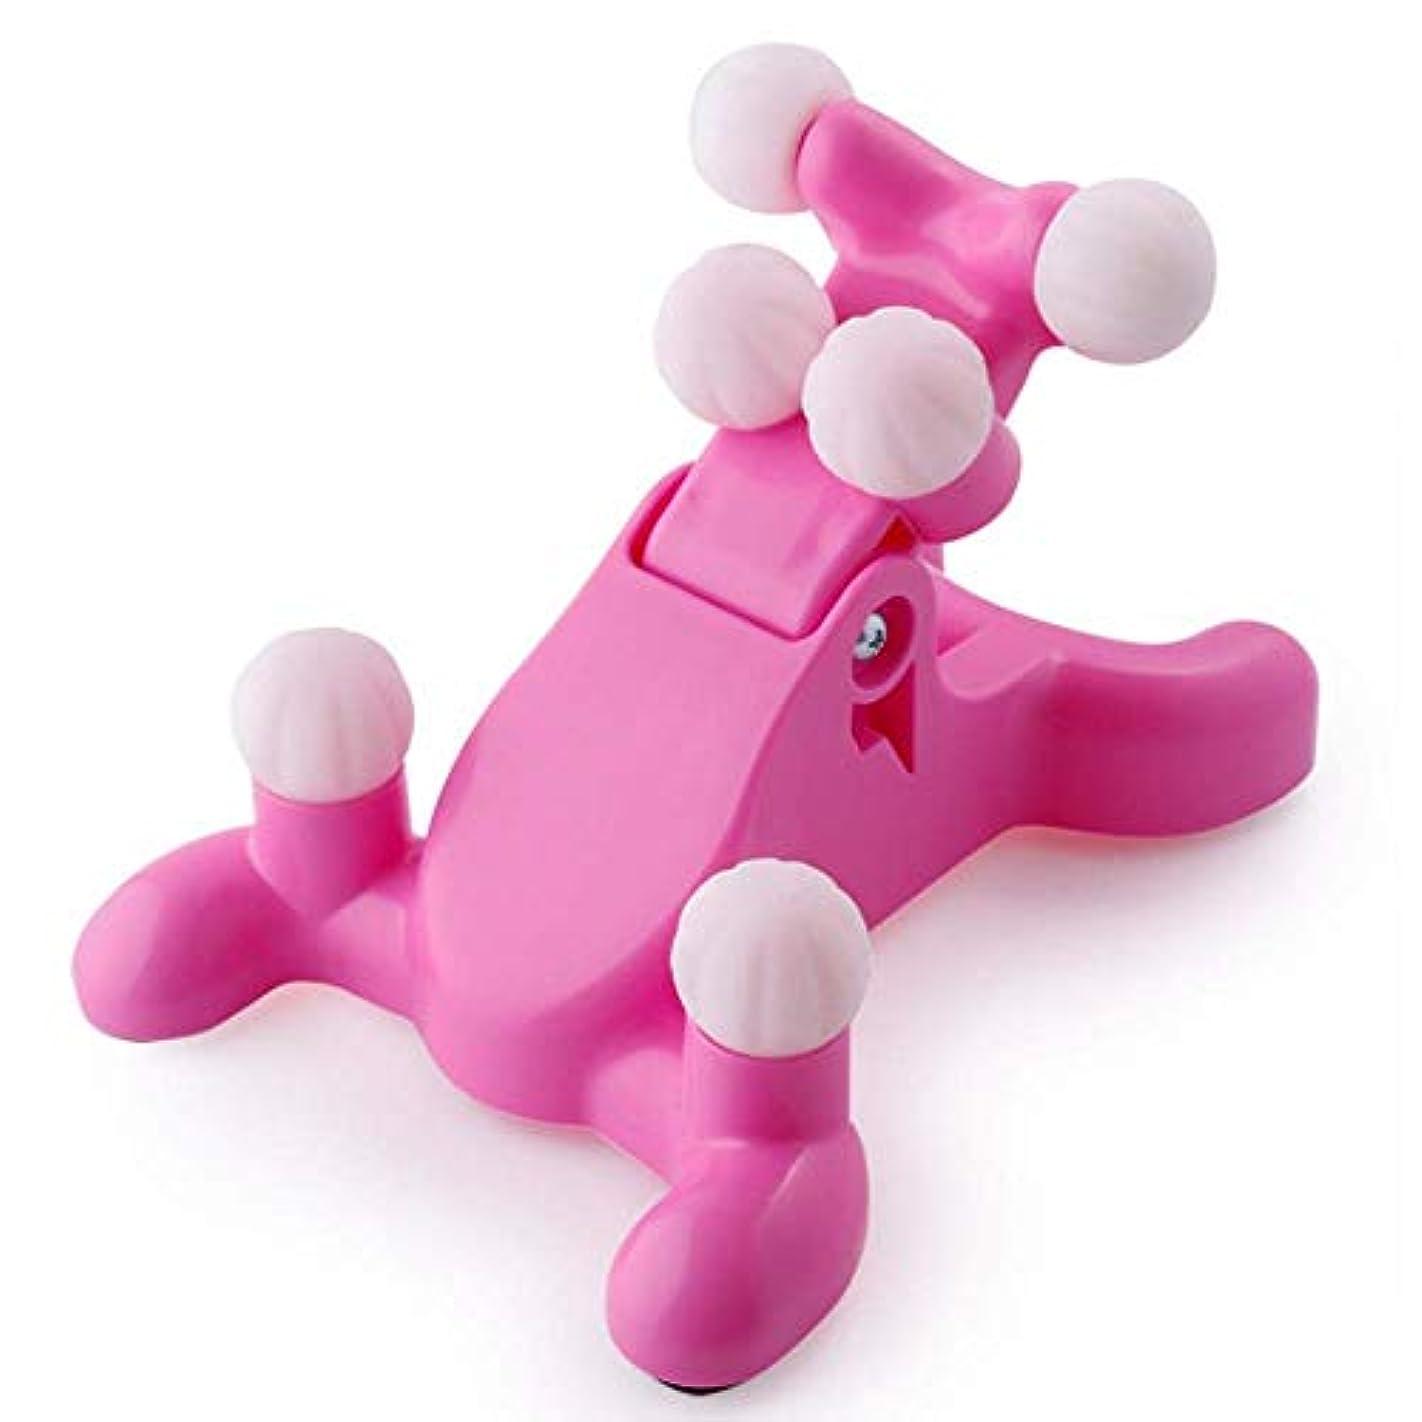 SUPFAN ネックマッサージャー ネックマッサージ器 首 マッサージ 肩こり 腰 ふくらはぎ 太もも 指圧代用器 ポイント消化,ネックマッサージャー、ネック&ショルダー指圧ディープティッシュトリガーポイント手動マッスルマッサージ